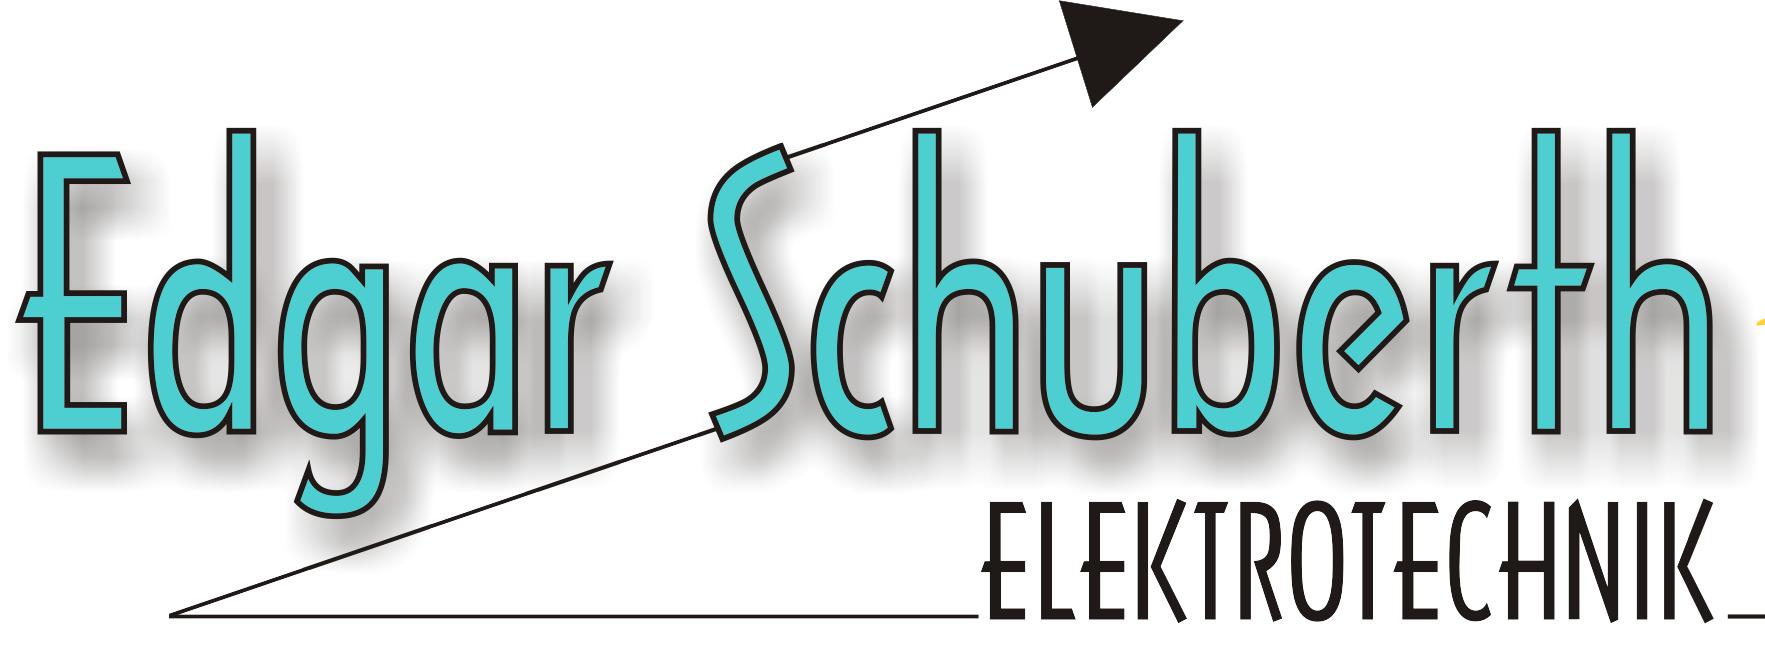 Schuberth Elektrotechnik